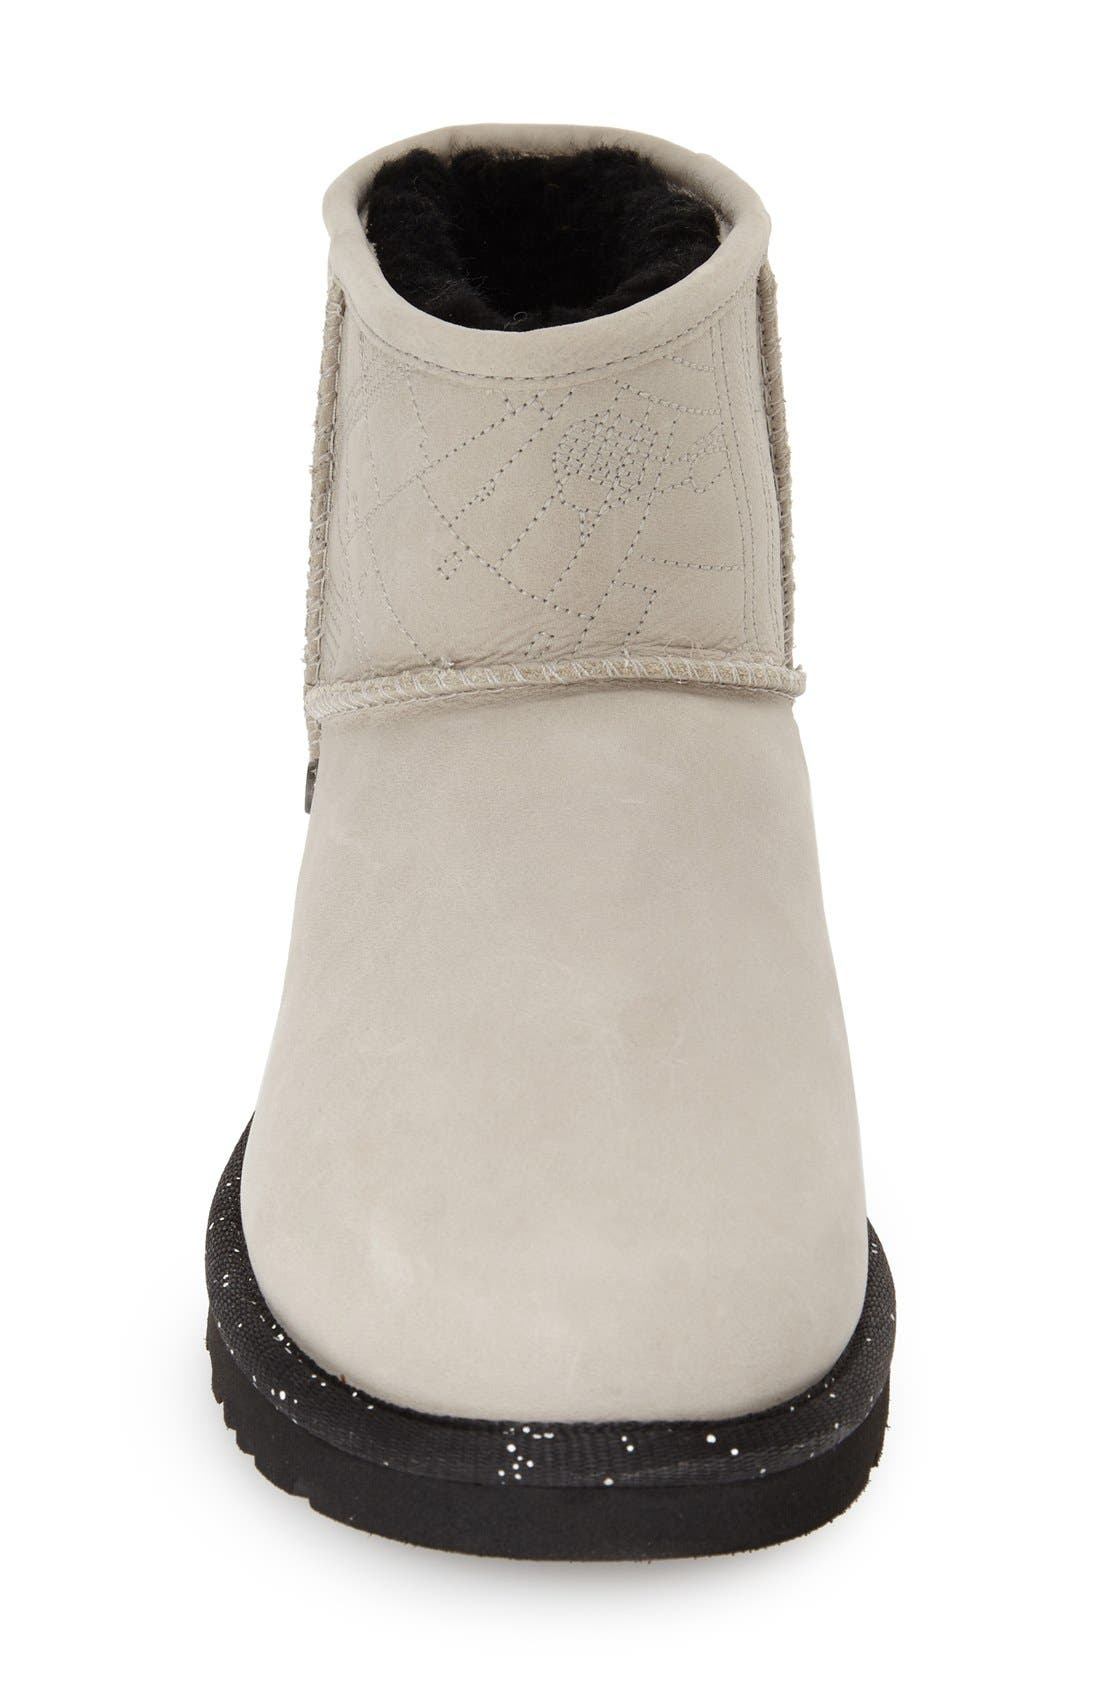 'Star Wars Millennium Falcon - Classic Mini' Water Resistant Short Boot,                             Alternate thumbnail 4, color,                             020